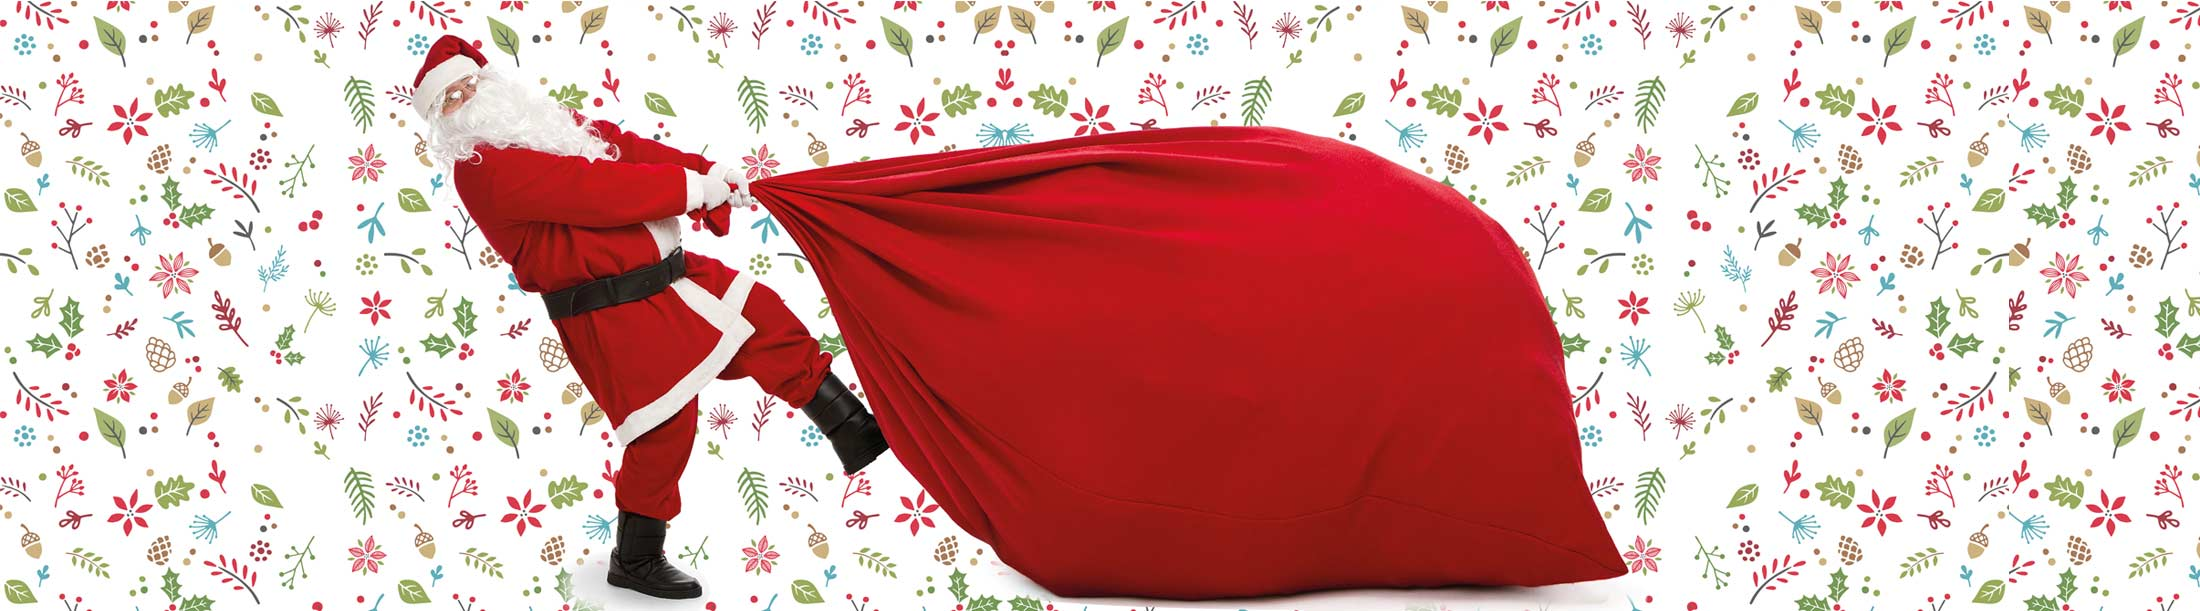 Frasi 1 Natale Insieme.Natale Aziende Medici Senza Frontiere Italia